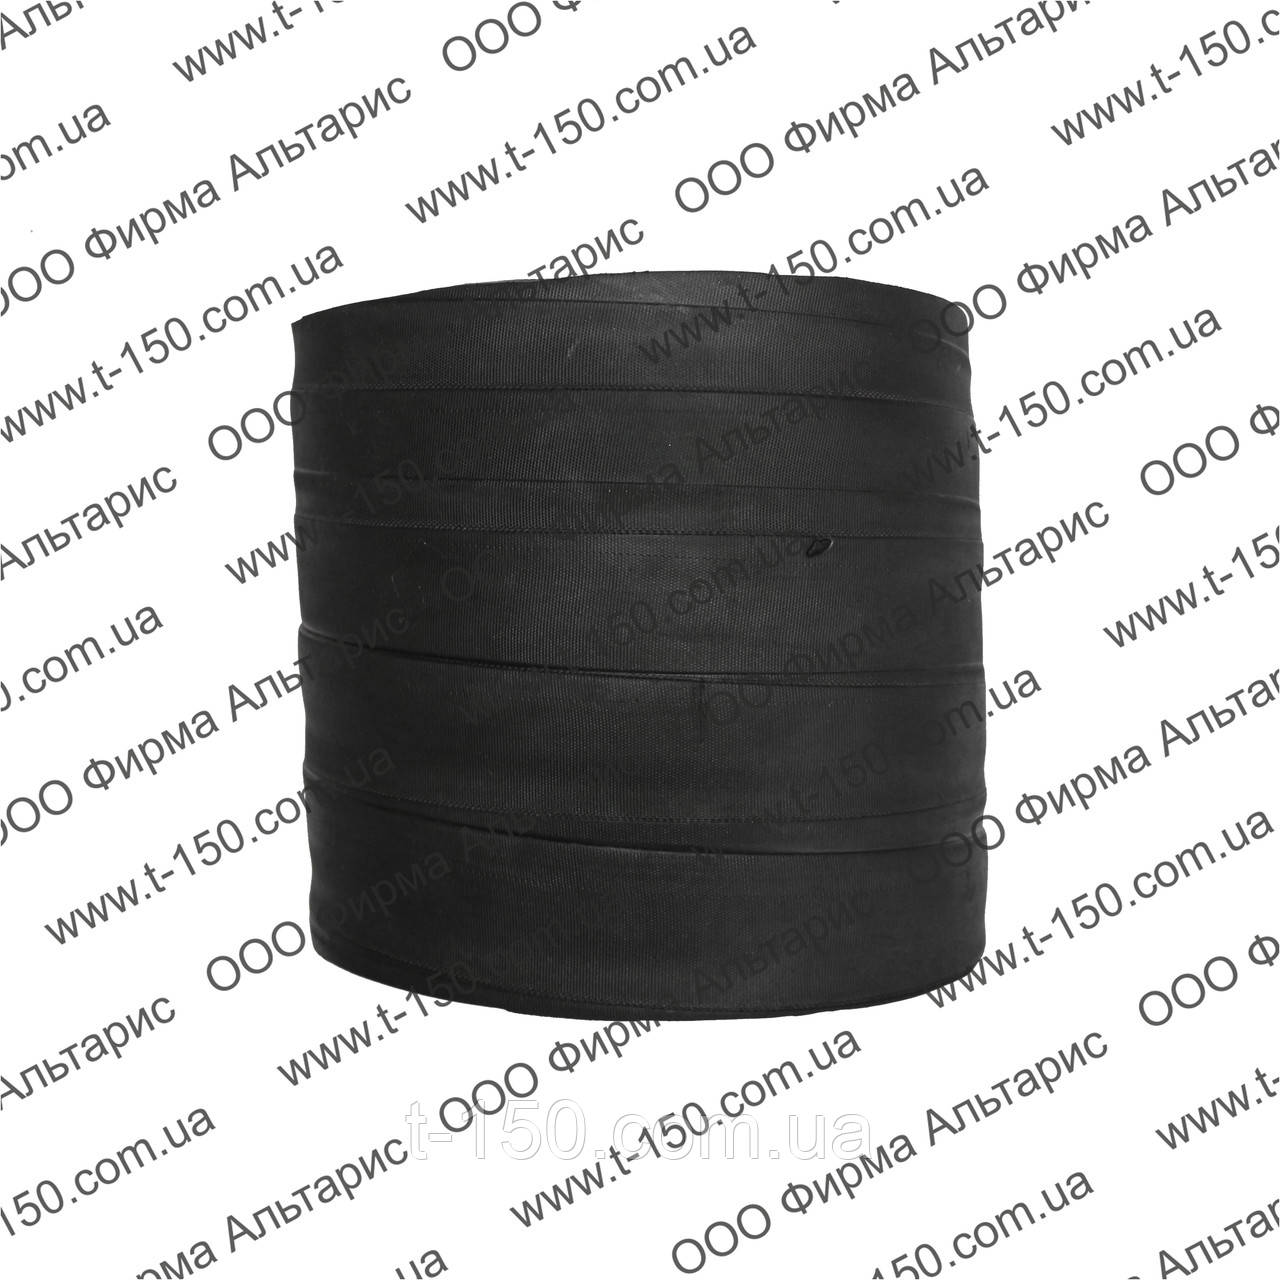 Патрубок воздушного фильтра ДОН-1500Б ЯМЗ-238АК,D=125 L=130, РСМ-10Б.03.00.008